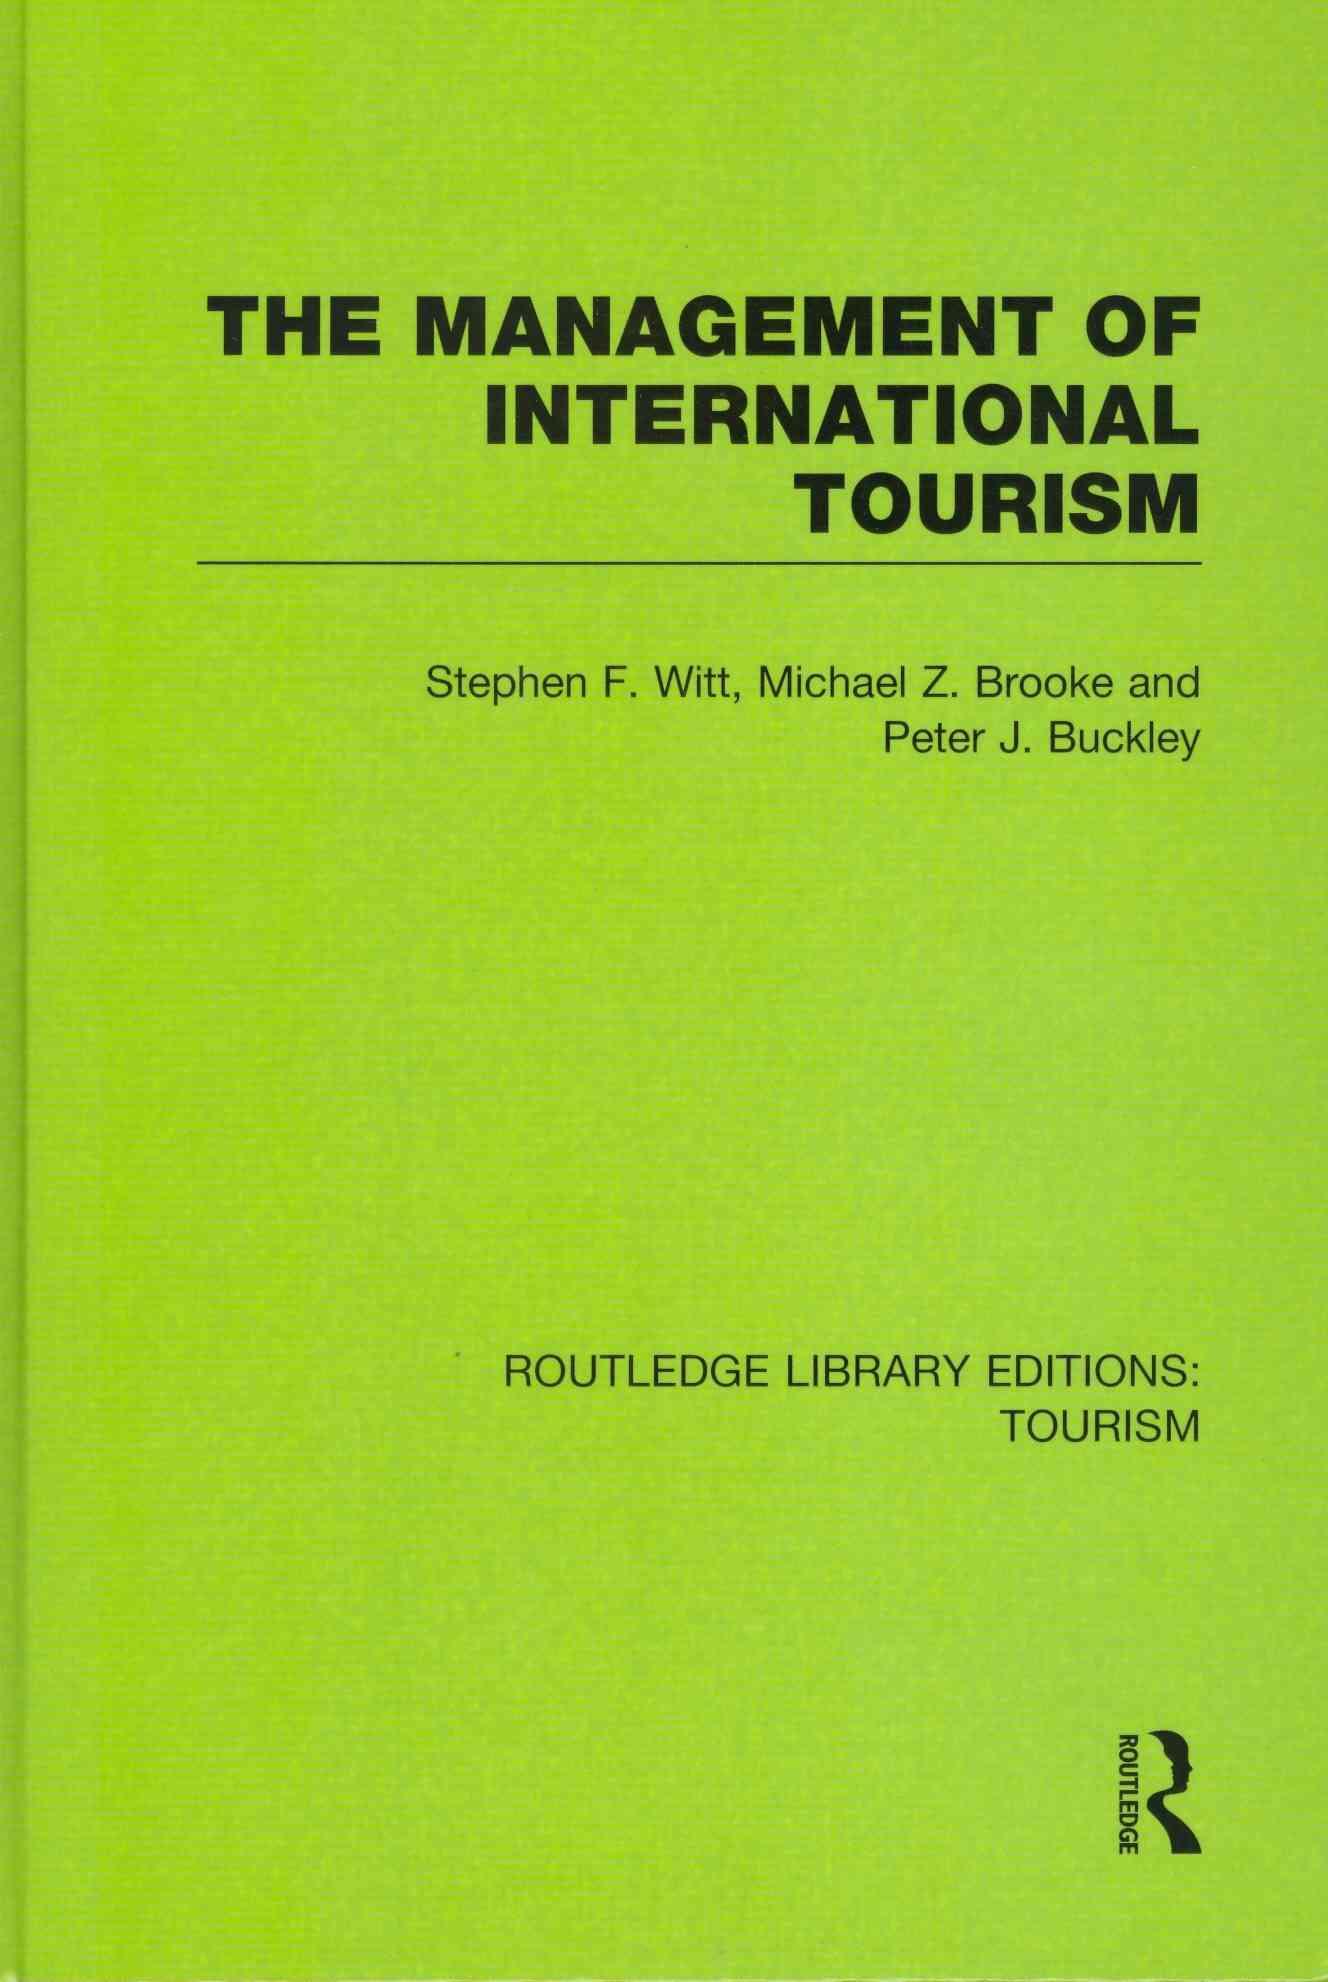 The Management of International Tourism By Witt, Stephen F./ Brooke, Michael Z./ Buckley, Peter J.